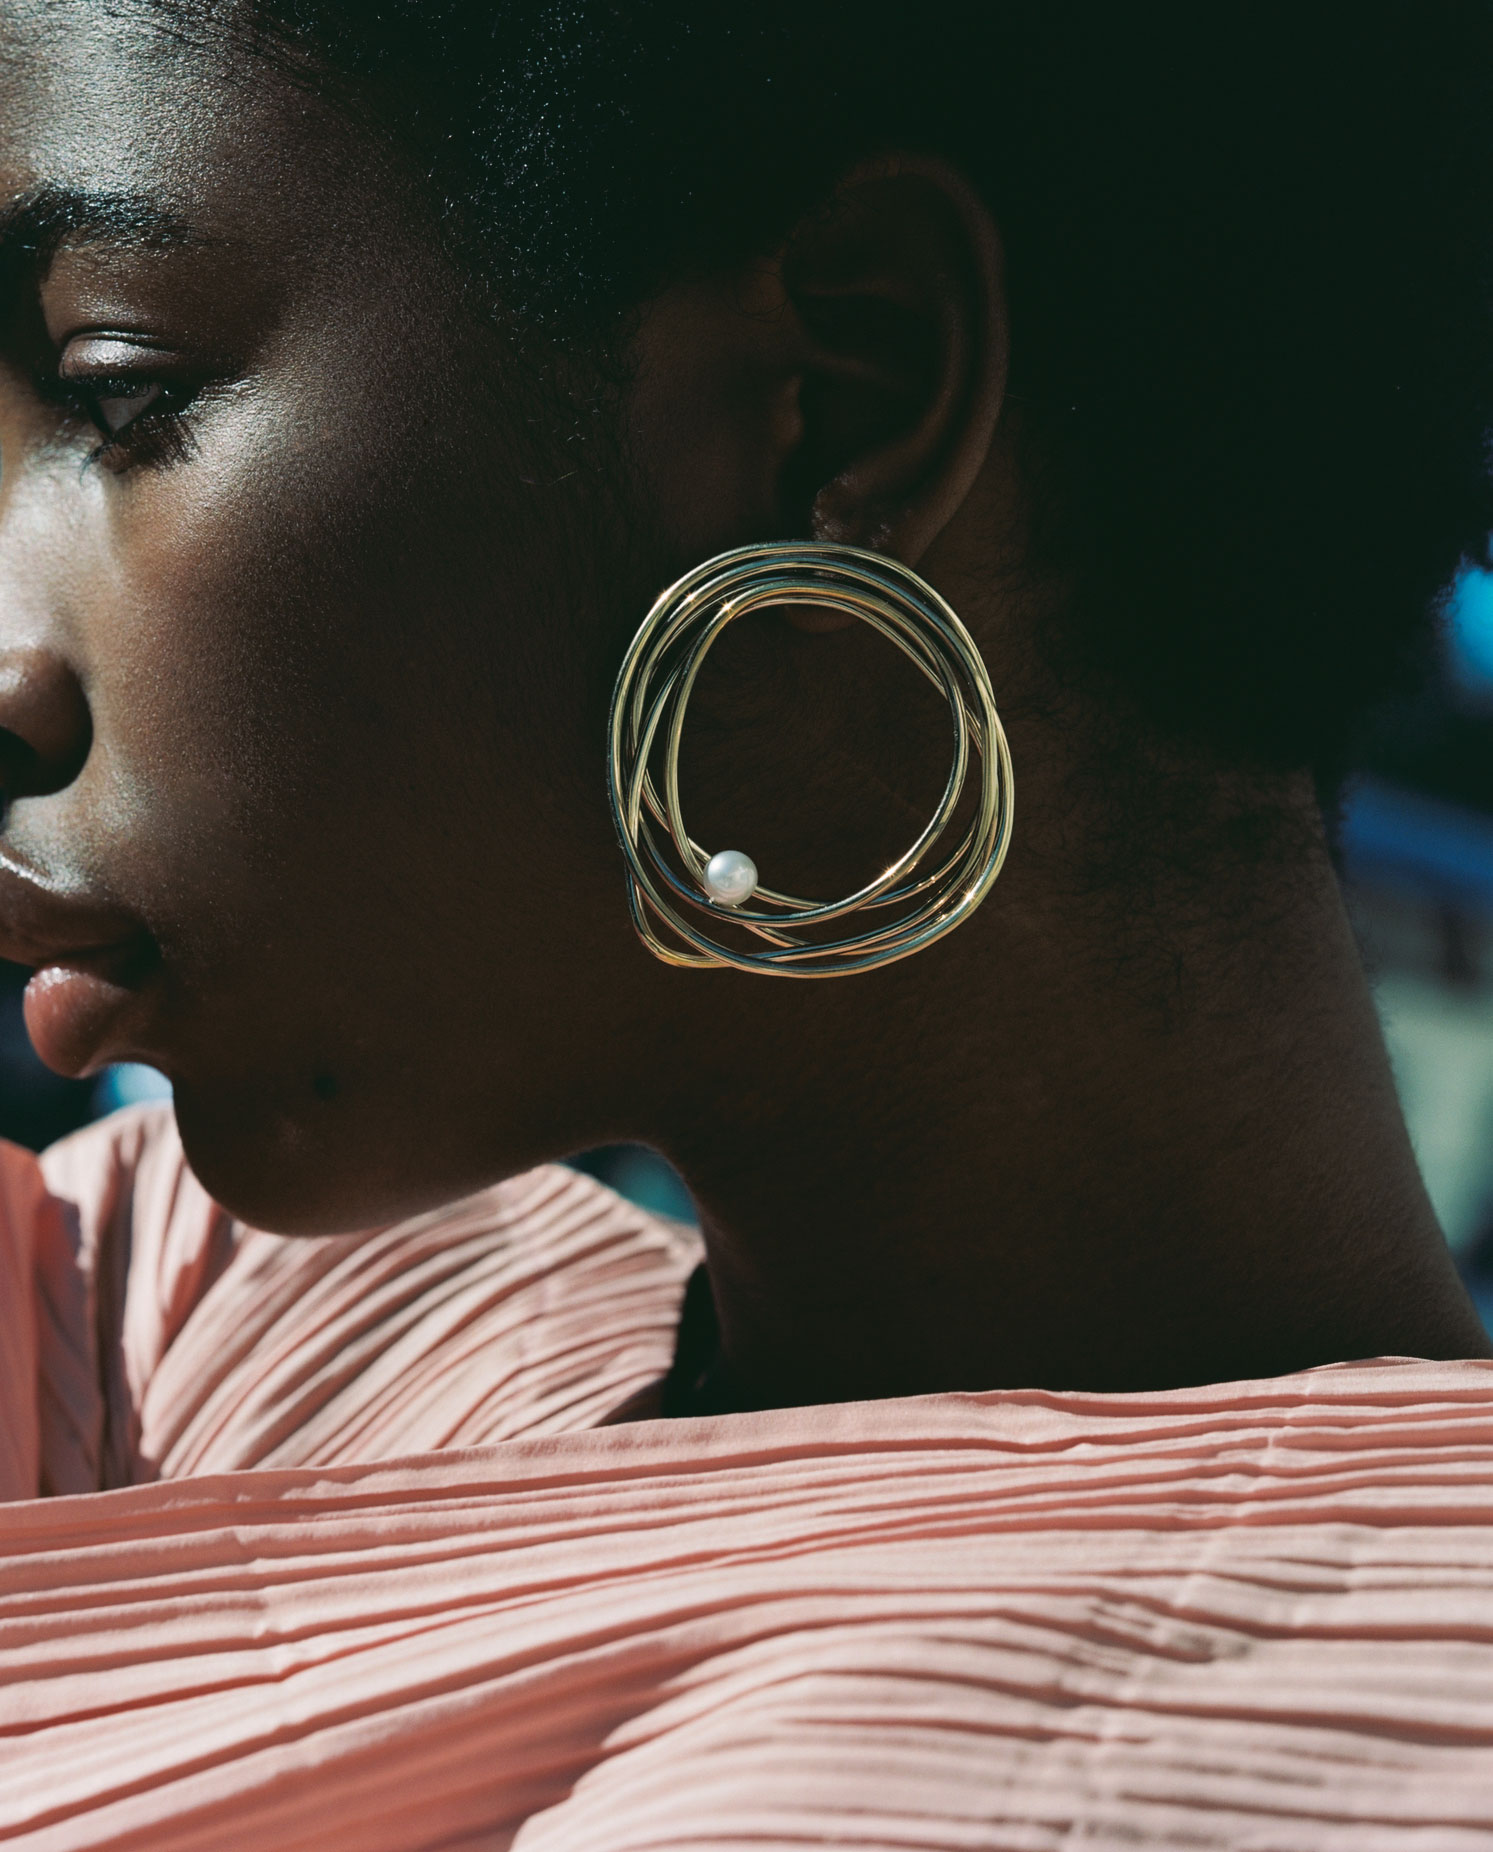 Completedworks_hoop_earrings_portrait_of_the_fin_de_siecle.jpg